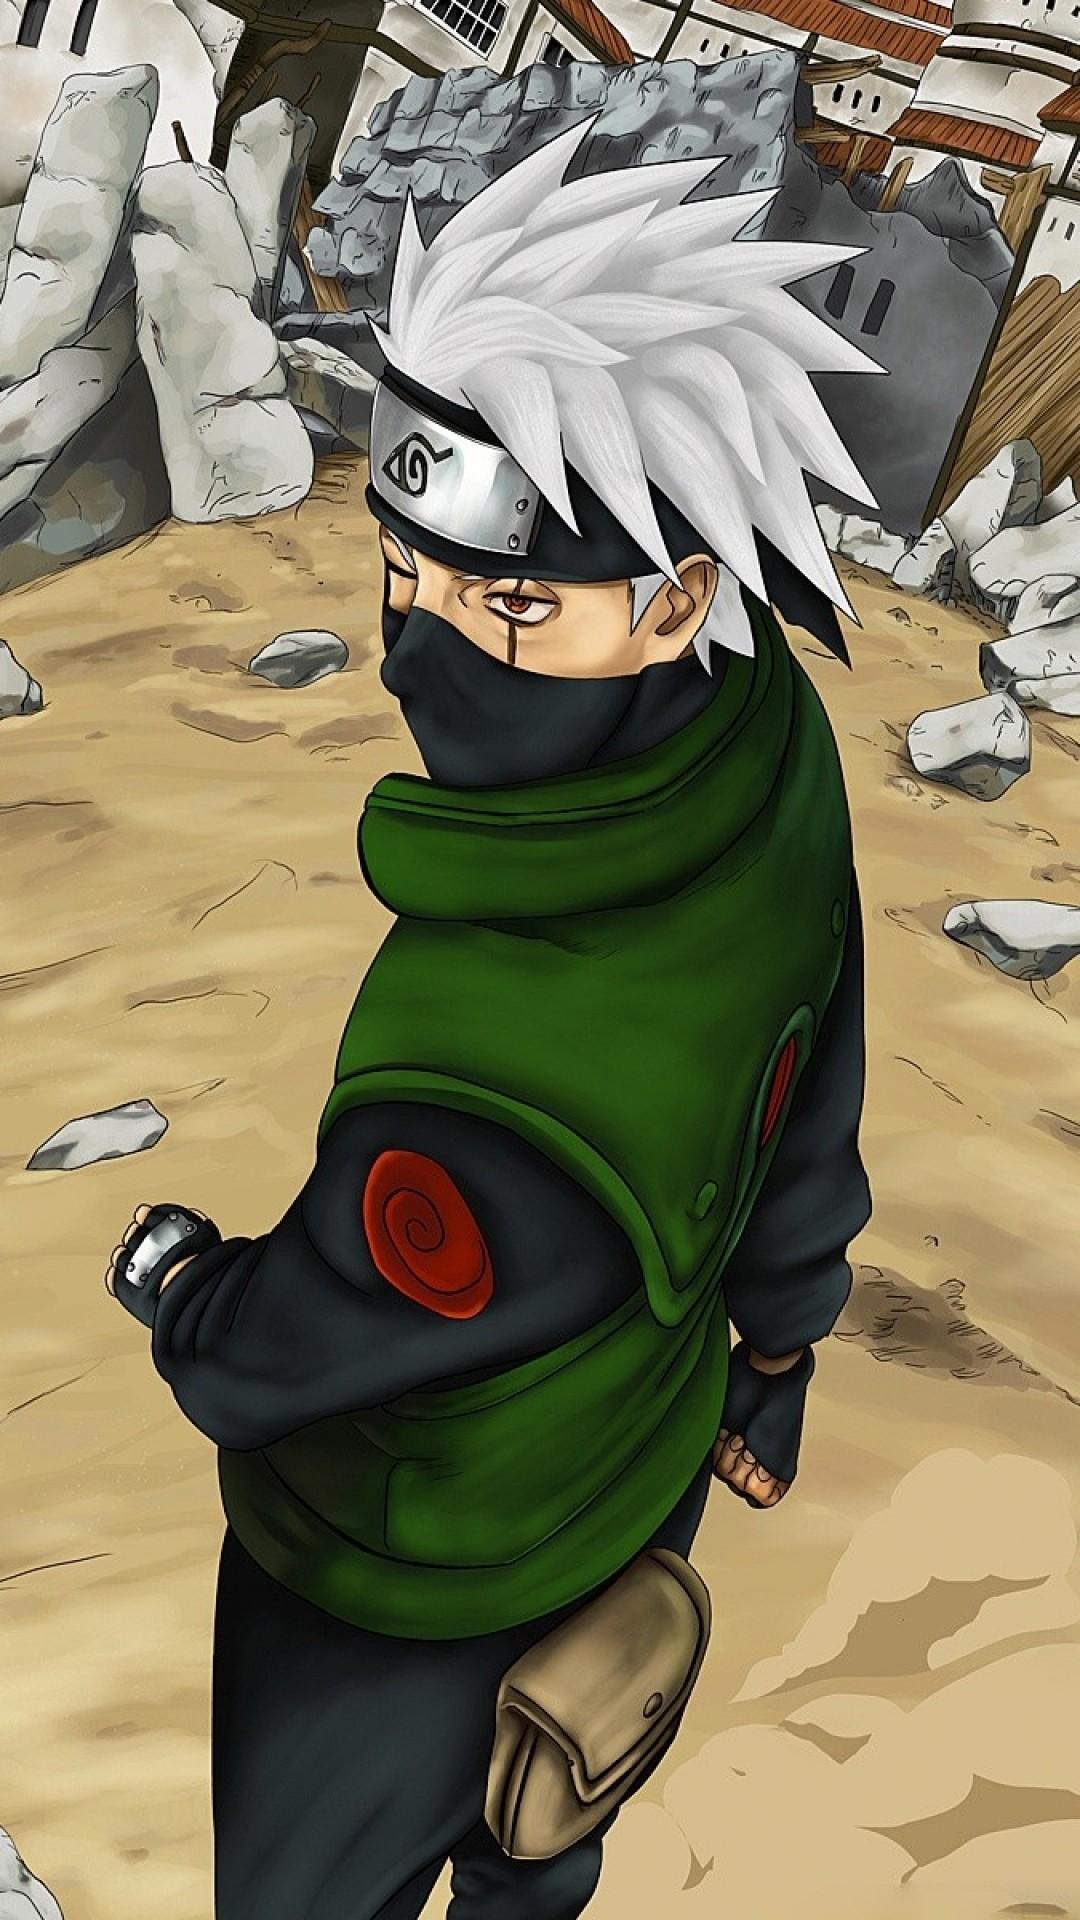 1080x1920 Wallpaper.wiki Naruto Iphone Background HD Free PIC